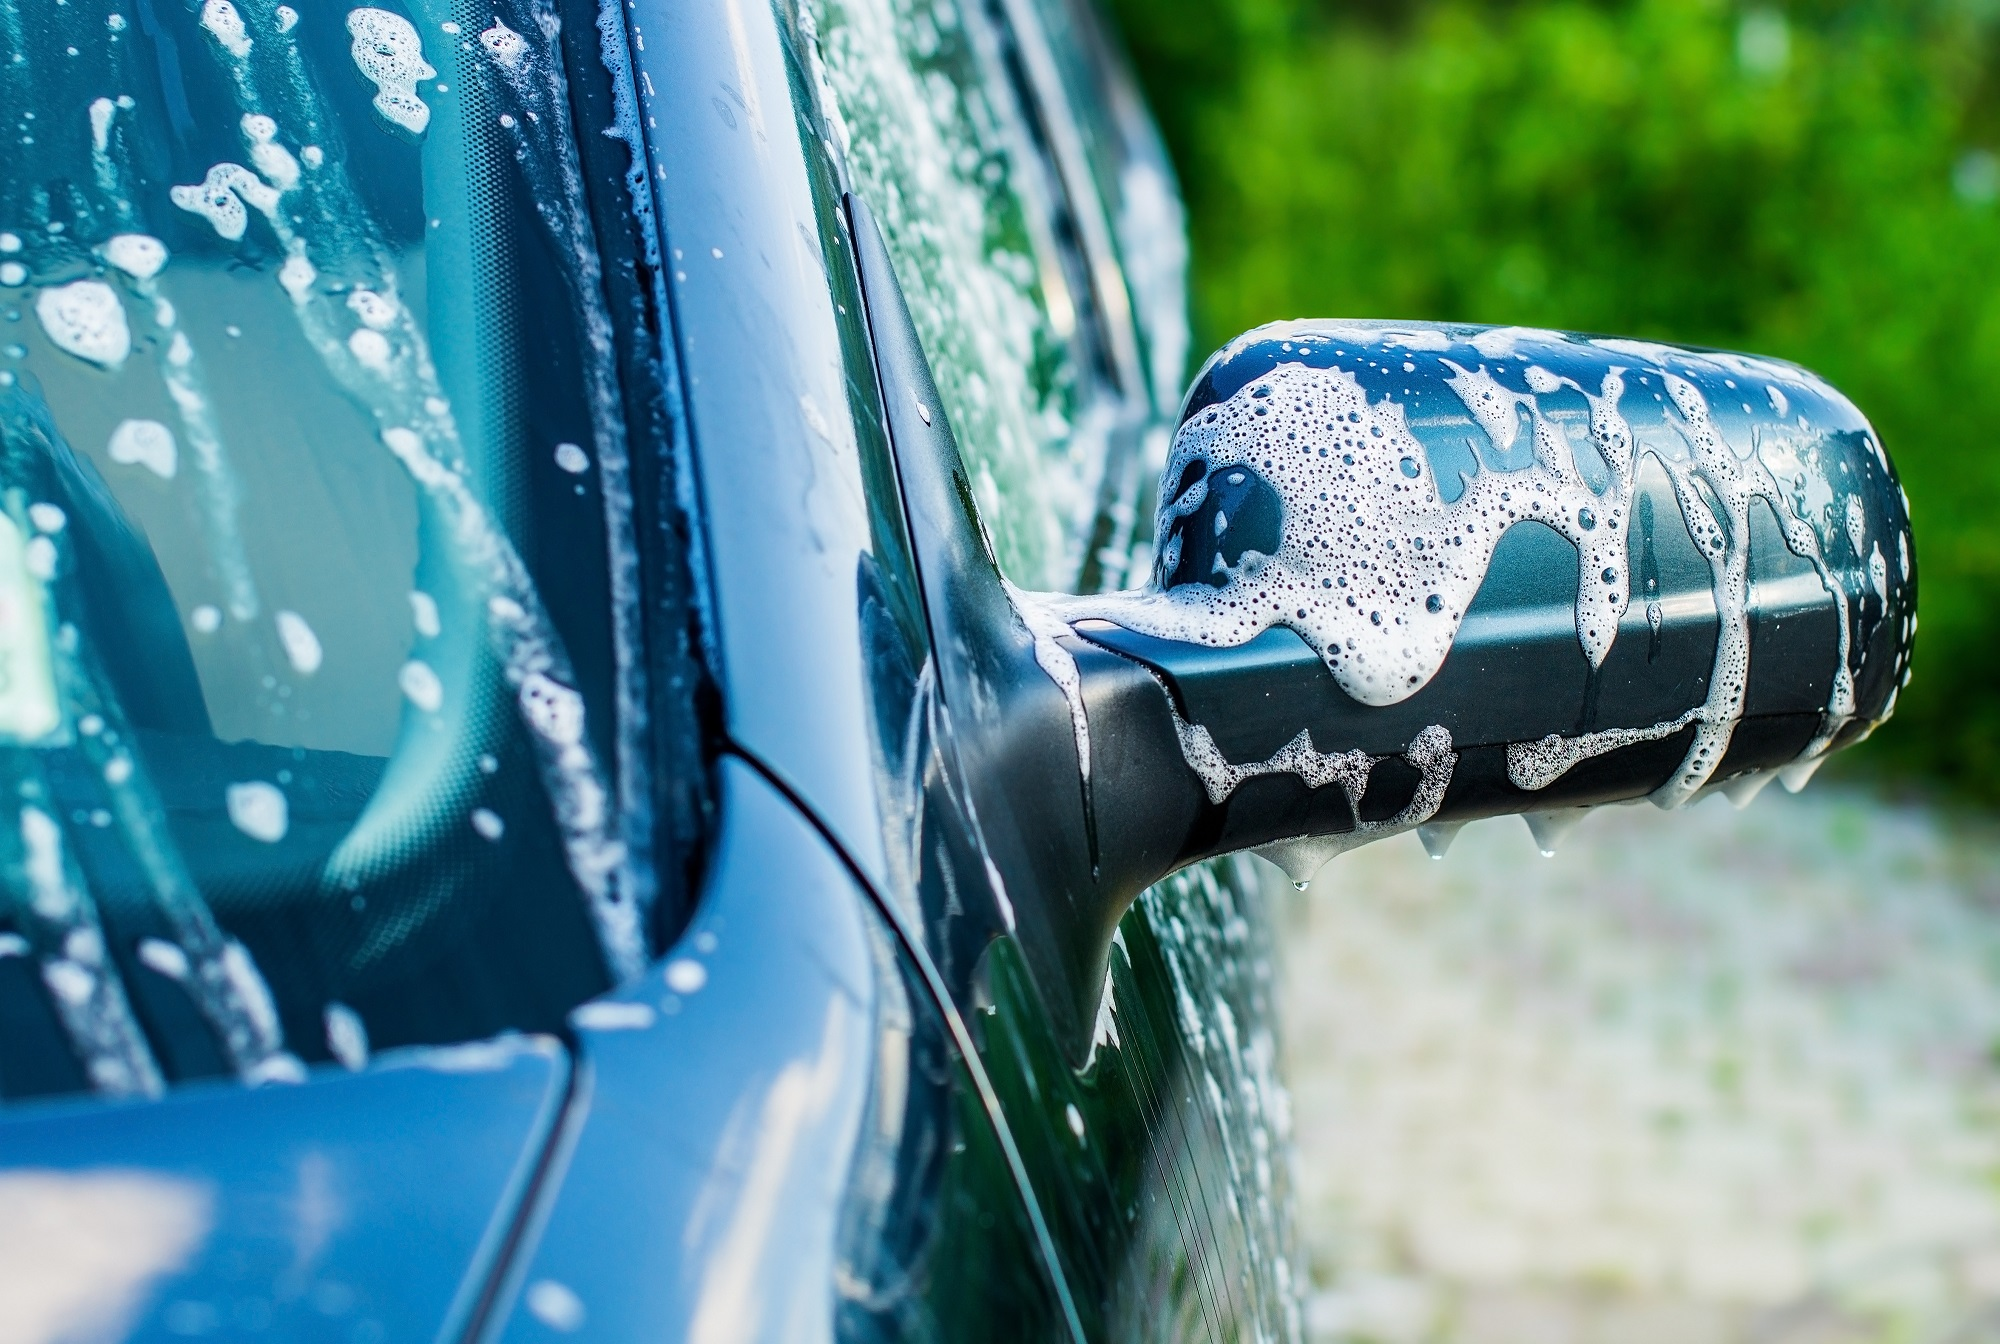 higienizacao automotiva lavar o carro sabao limpeza lataria